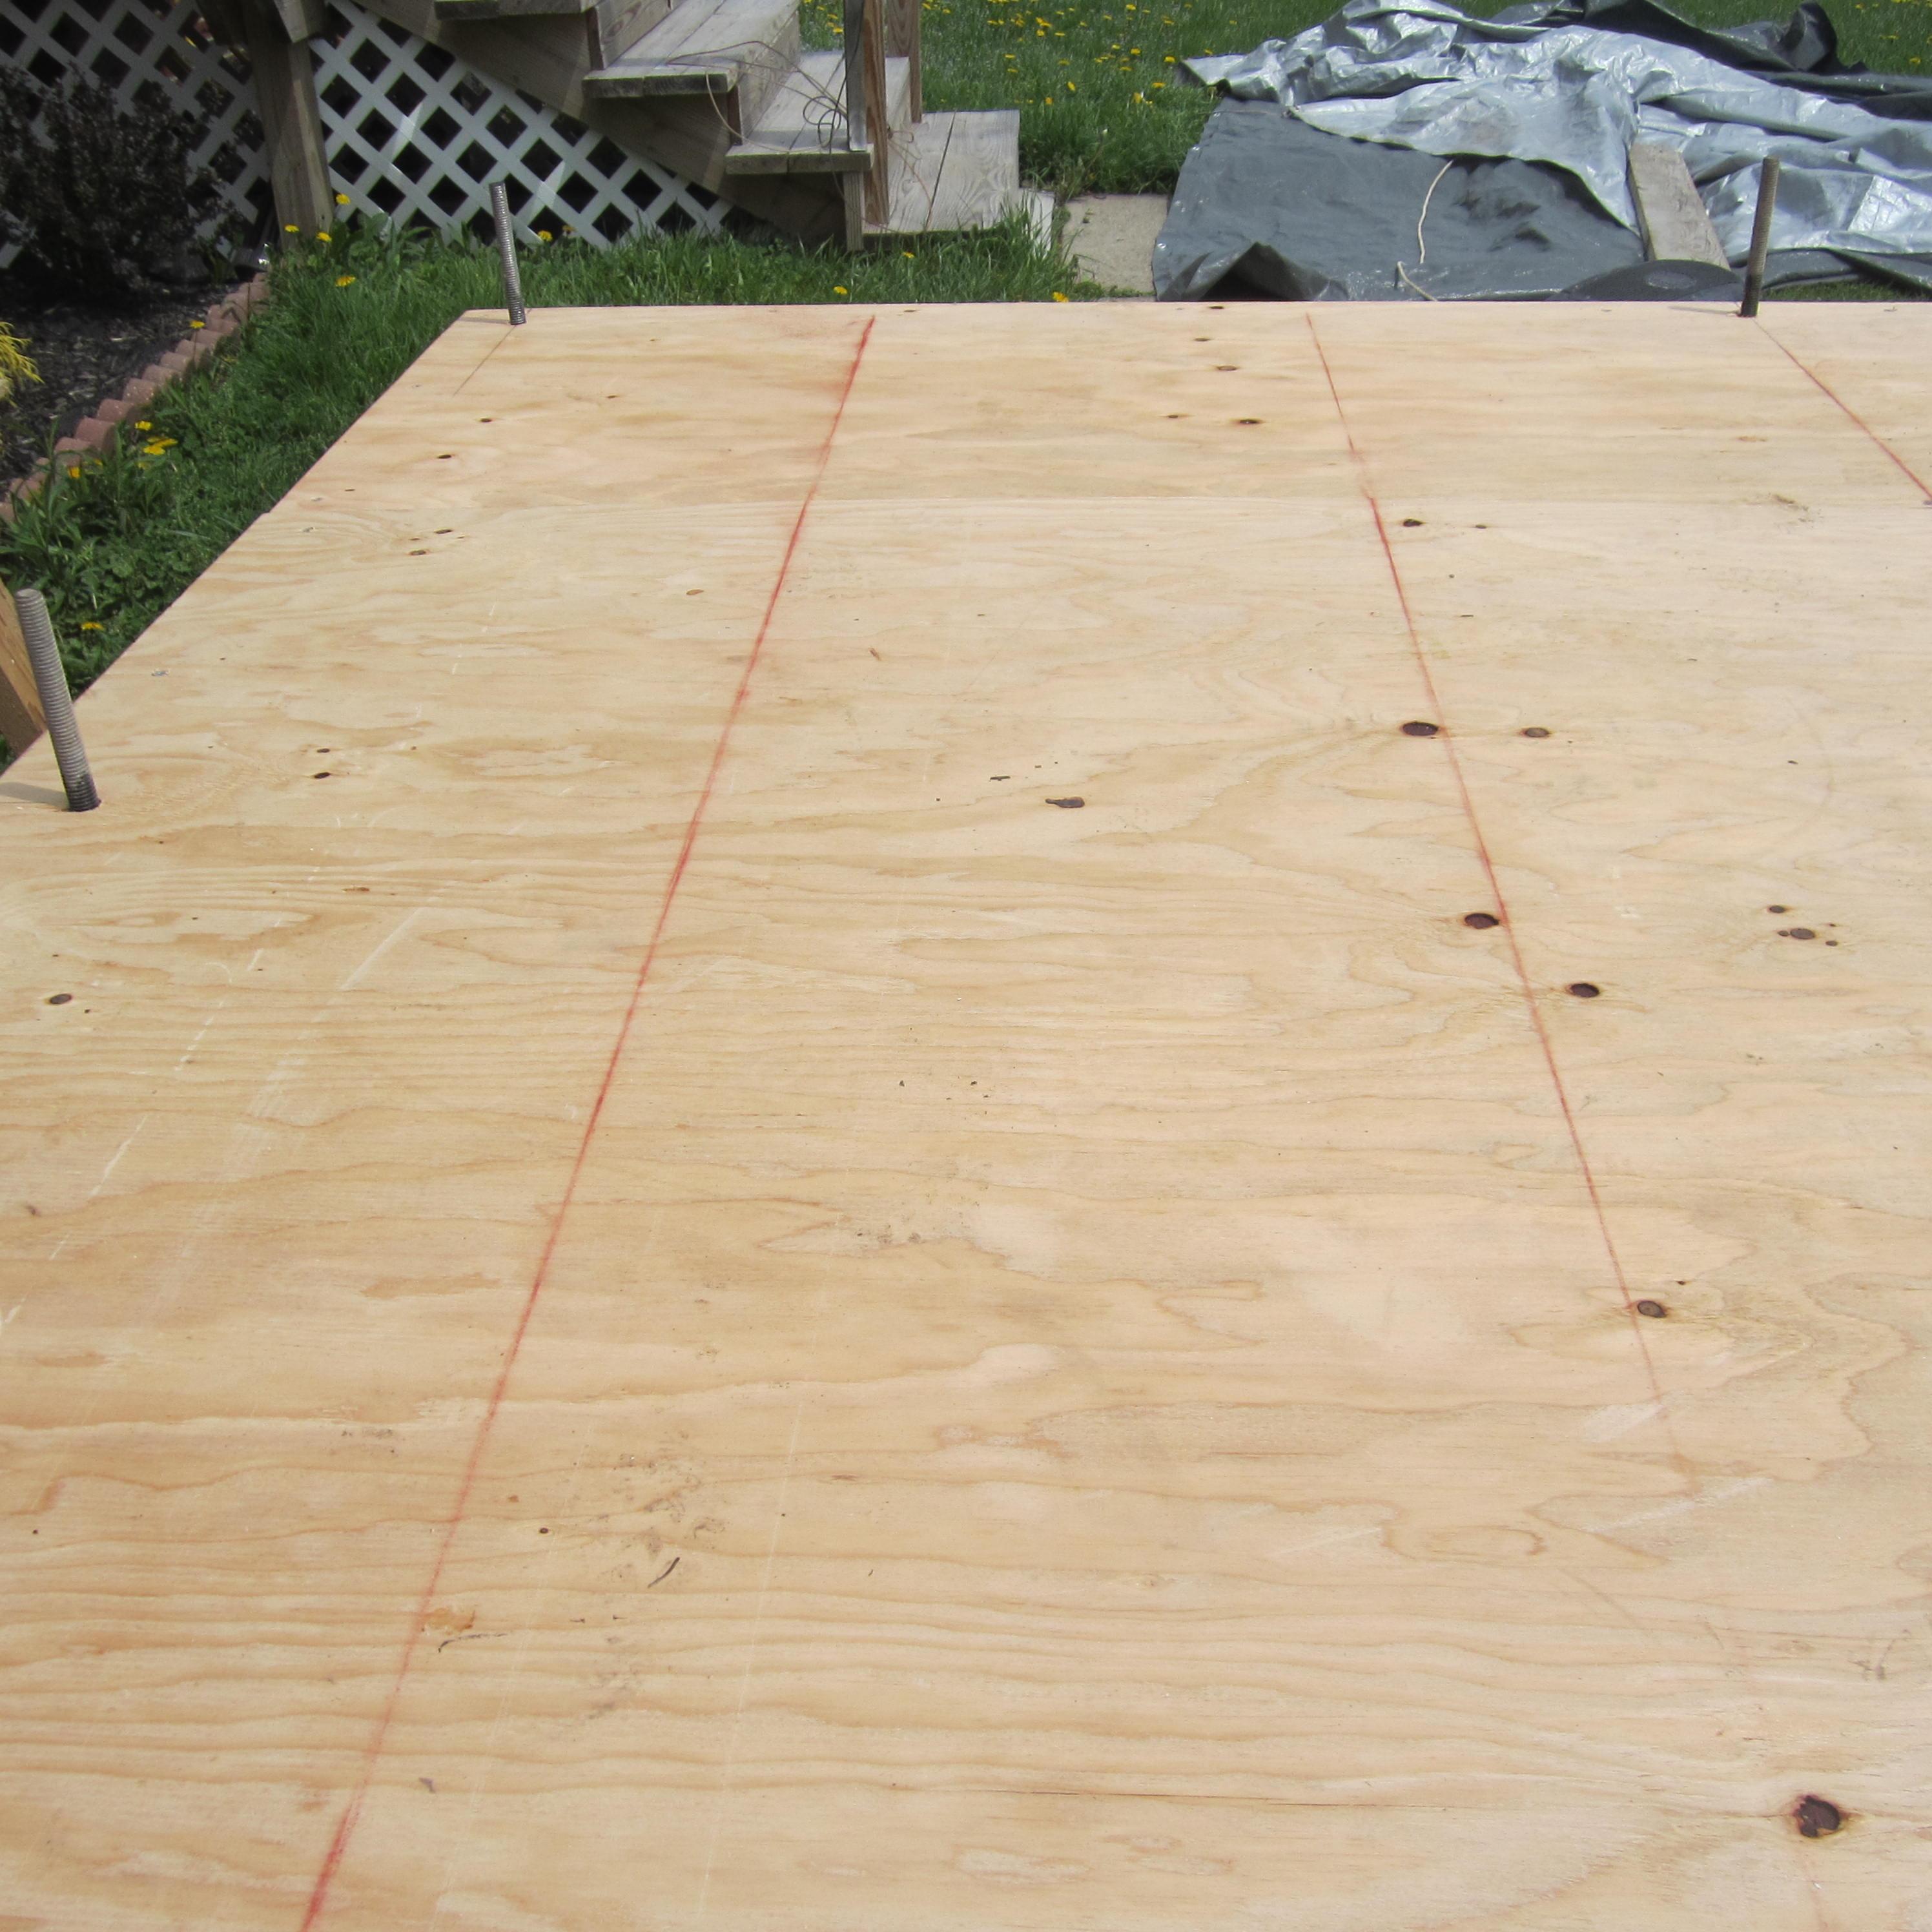 1 Inch Plywood ~ Tiny house subfloor design bottom up evolutions